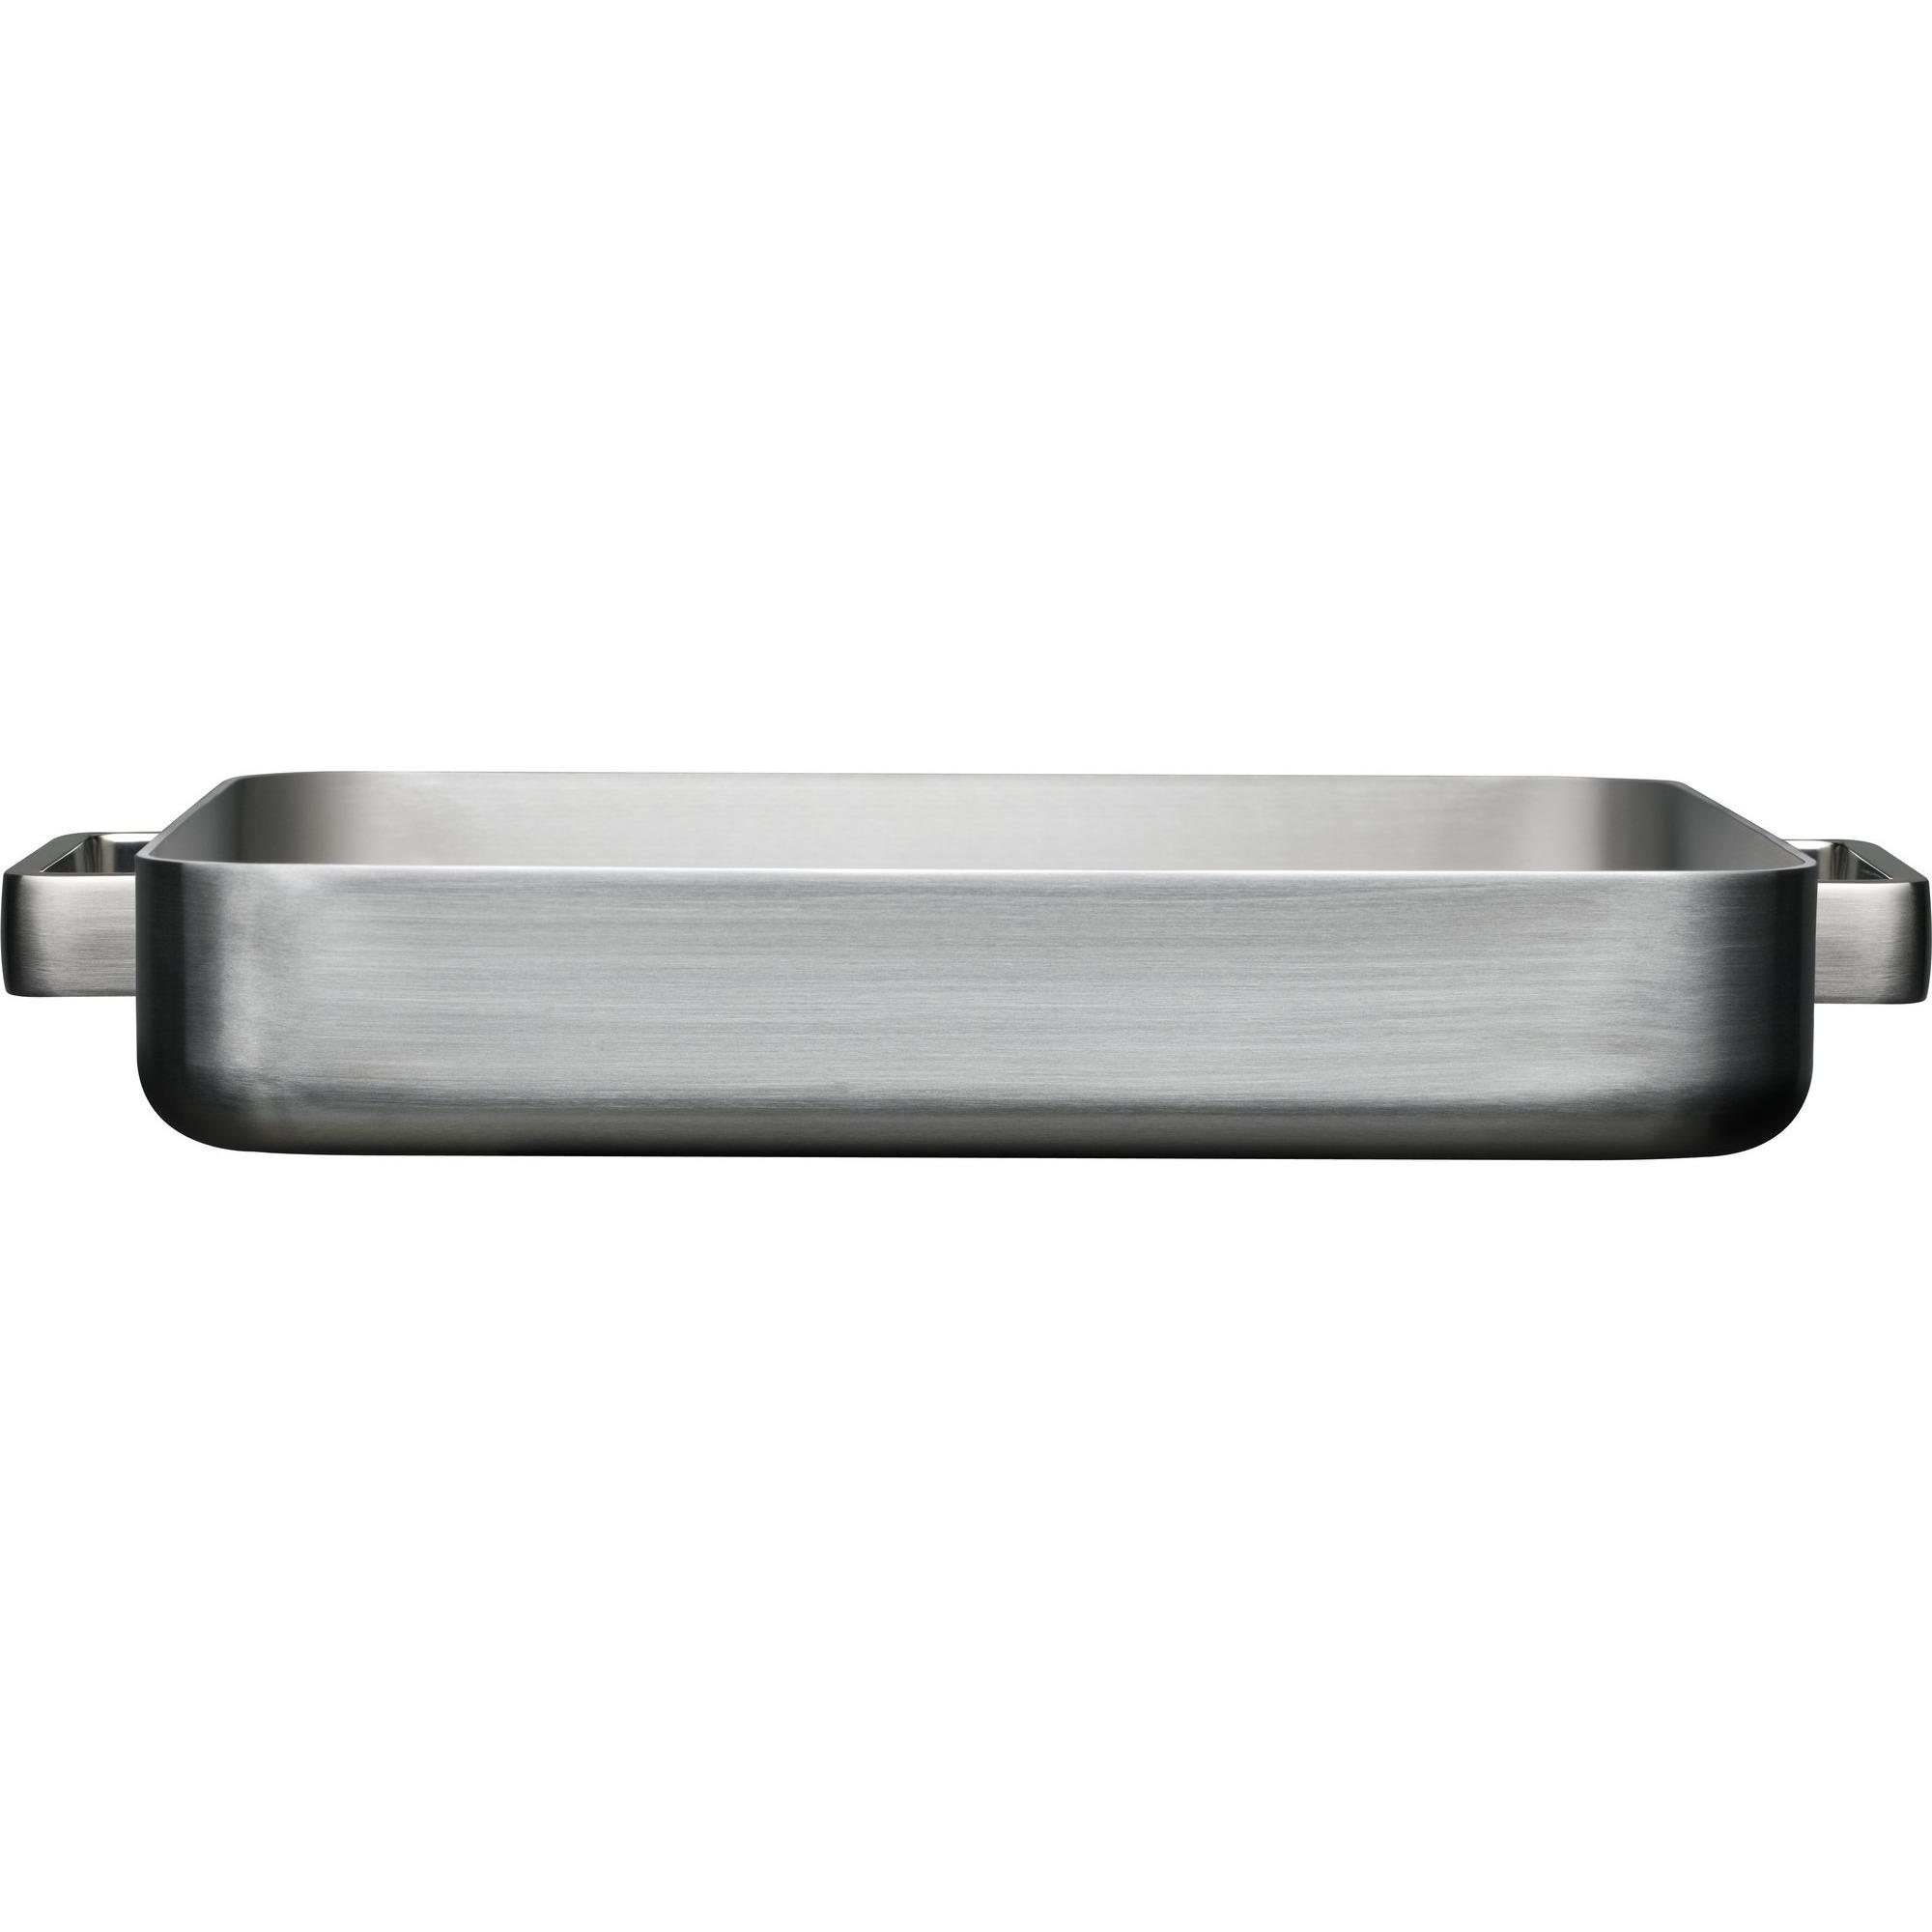 Iittala Tools Ugnsform 41cm x 37cm x 6cm